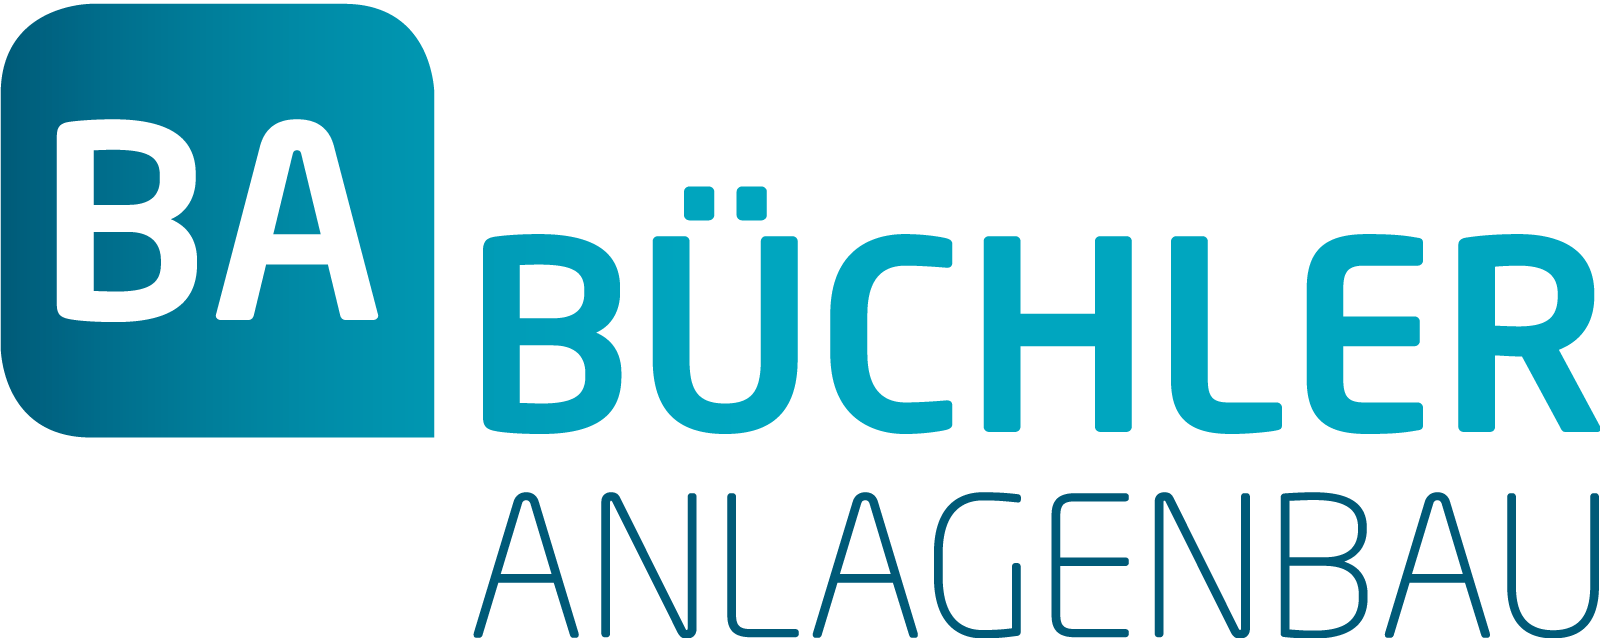 Büchler Anlagenbau AG